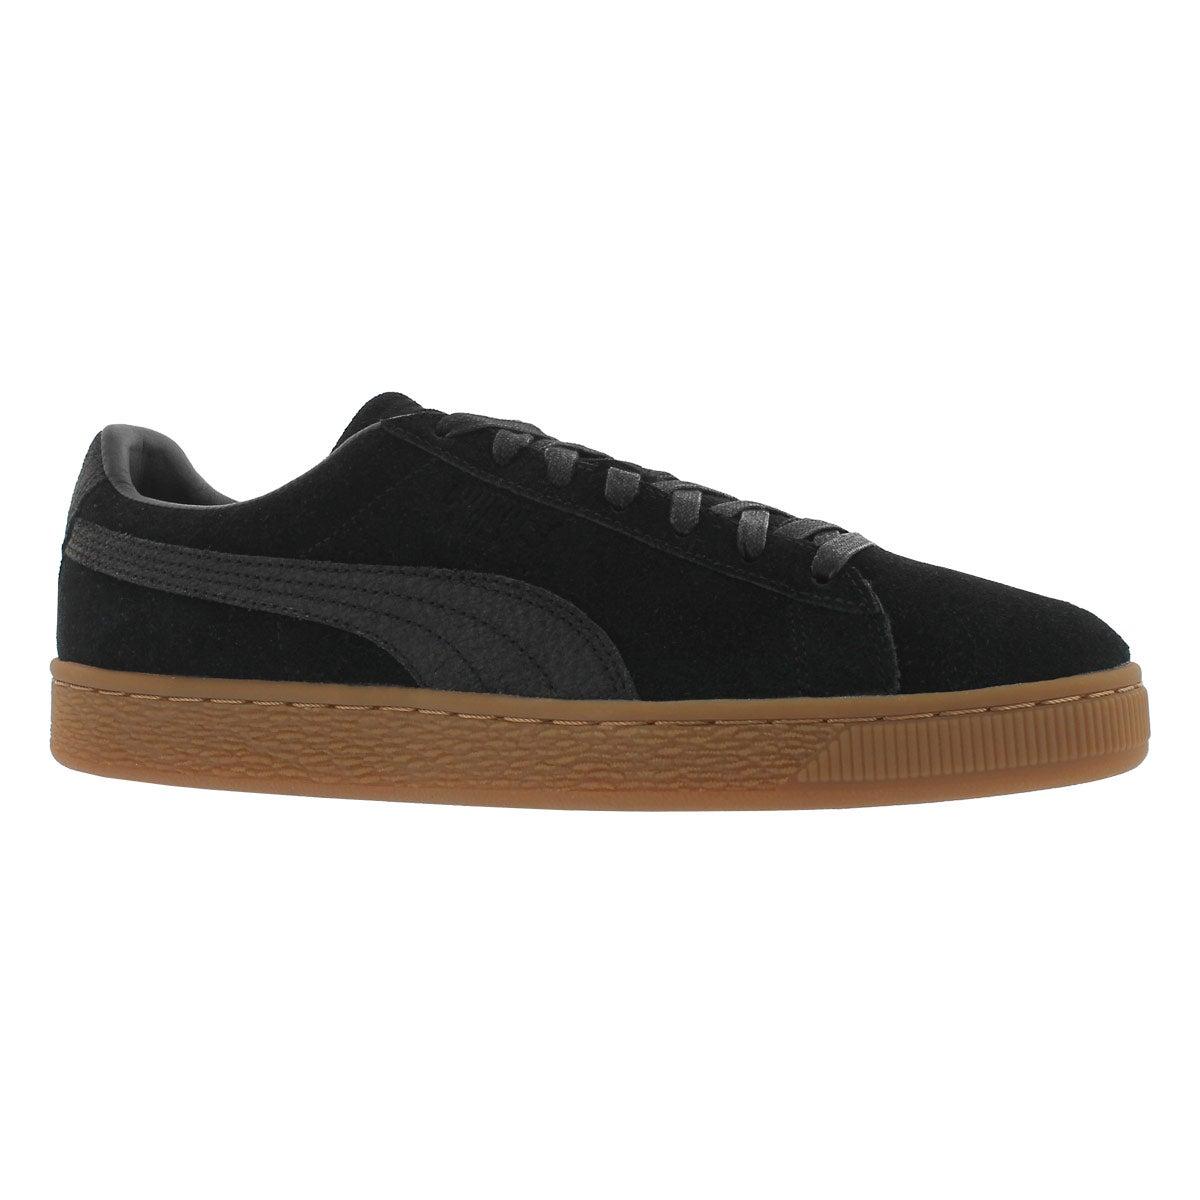 Men's CLASSIC NATURAL WARMTH black sneakers